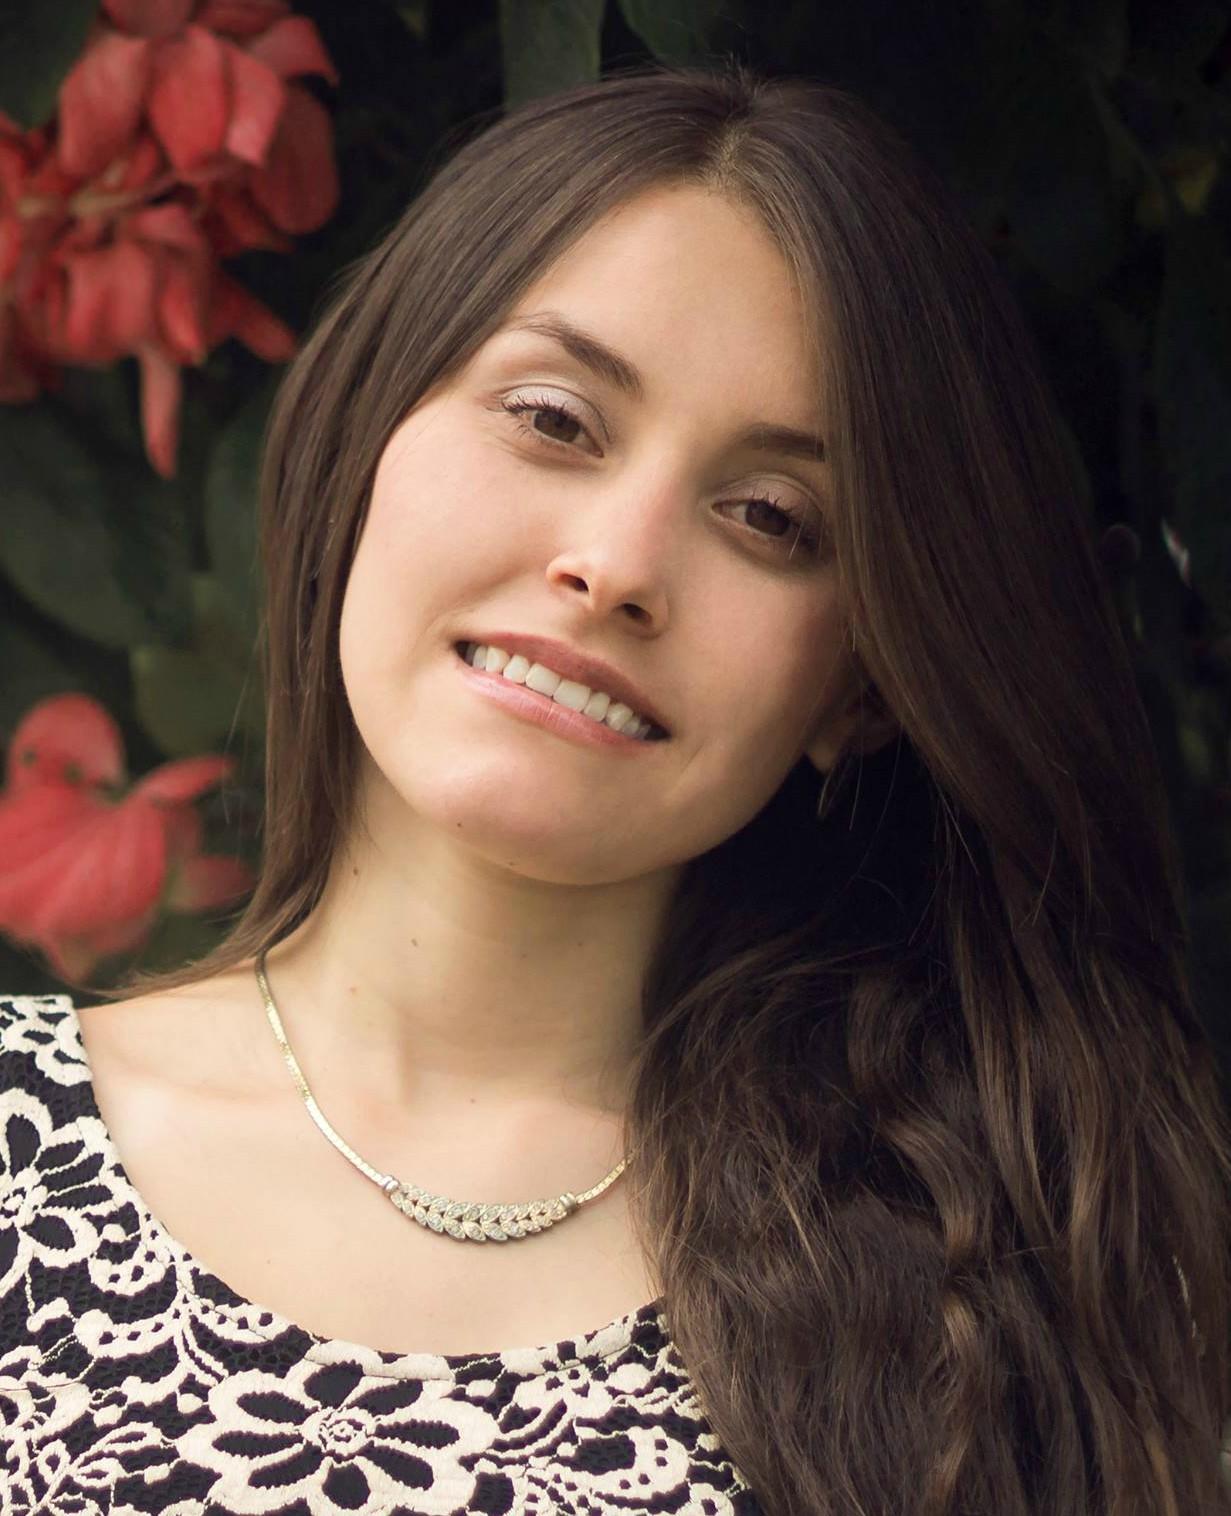 Andrea Alger